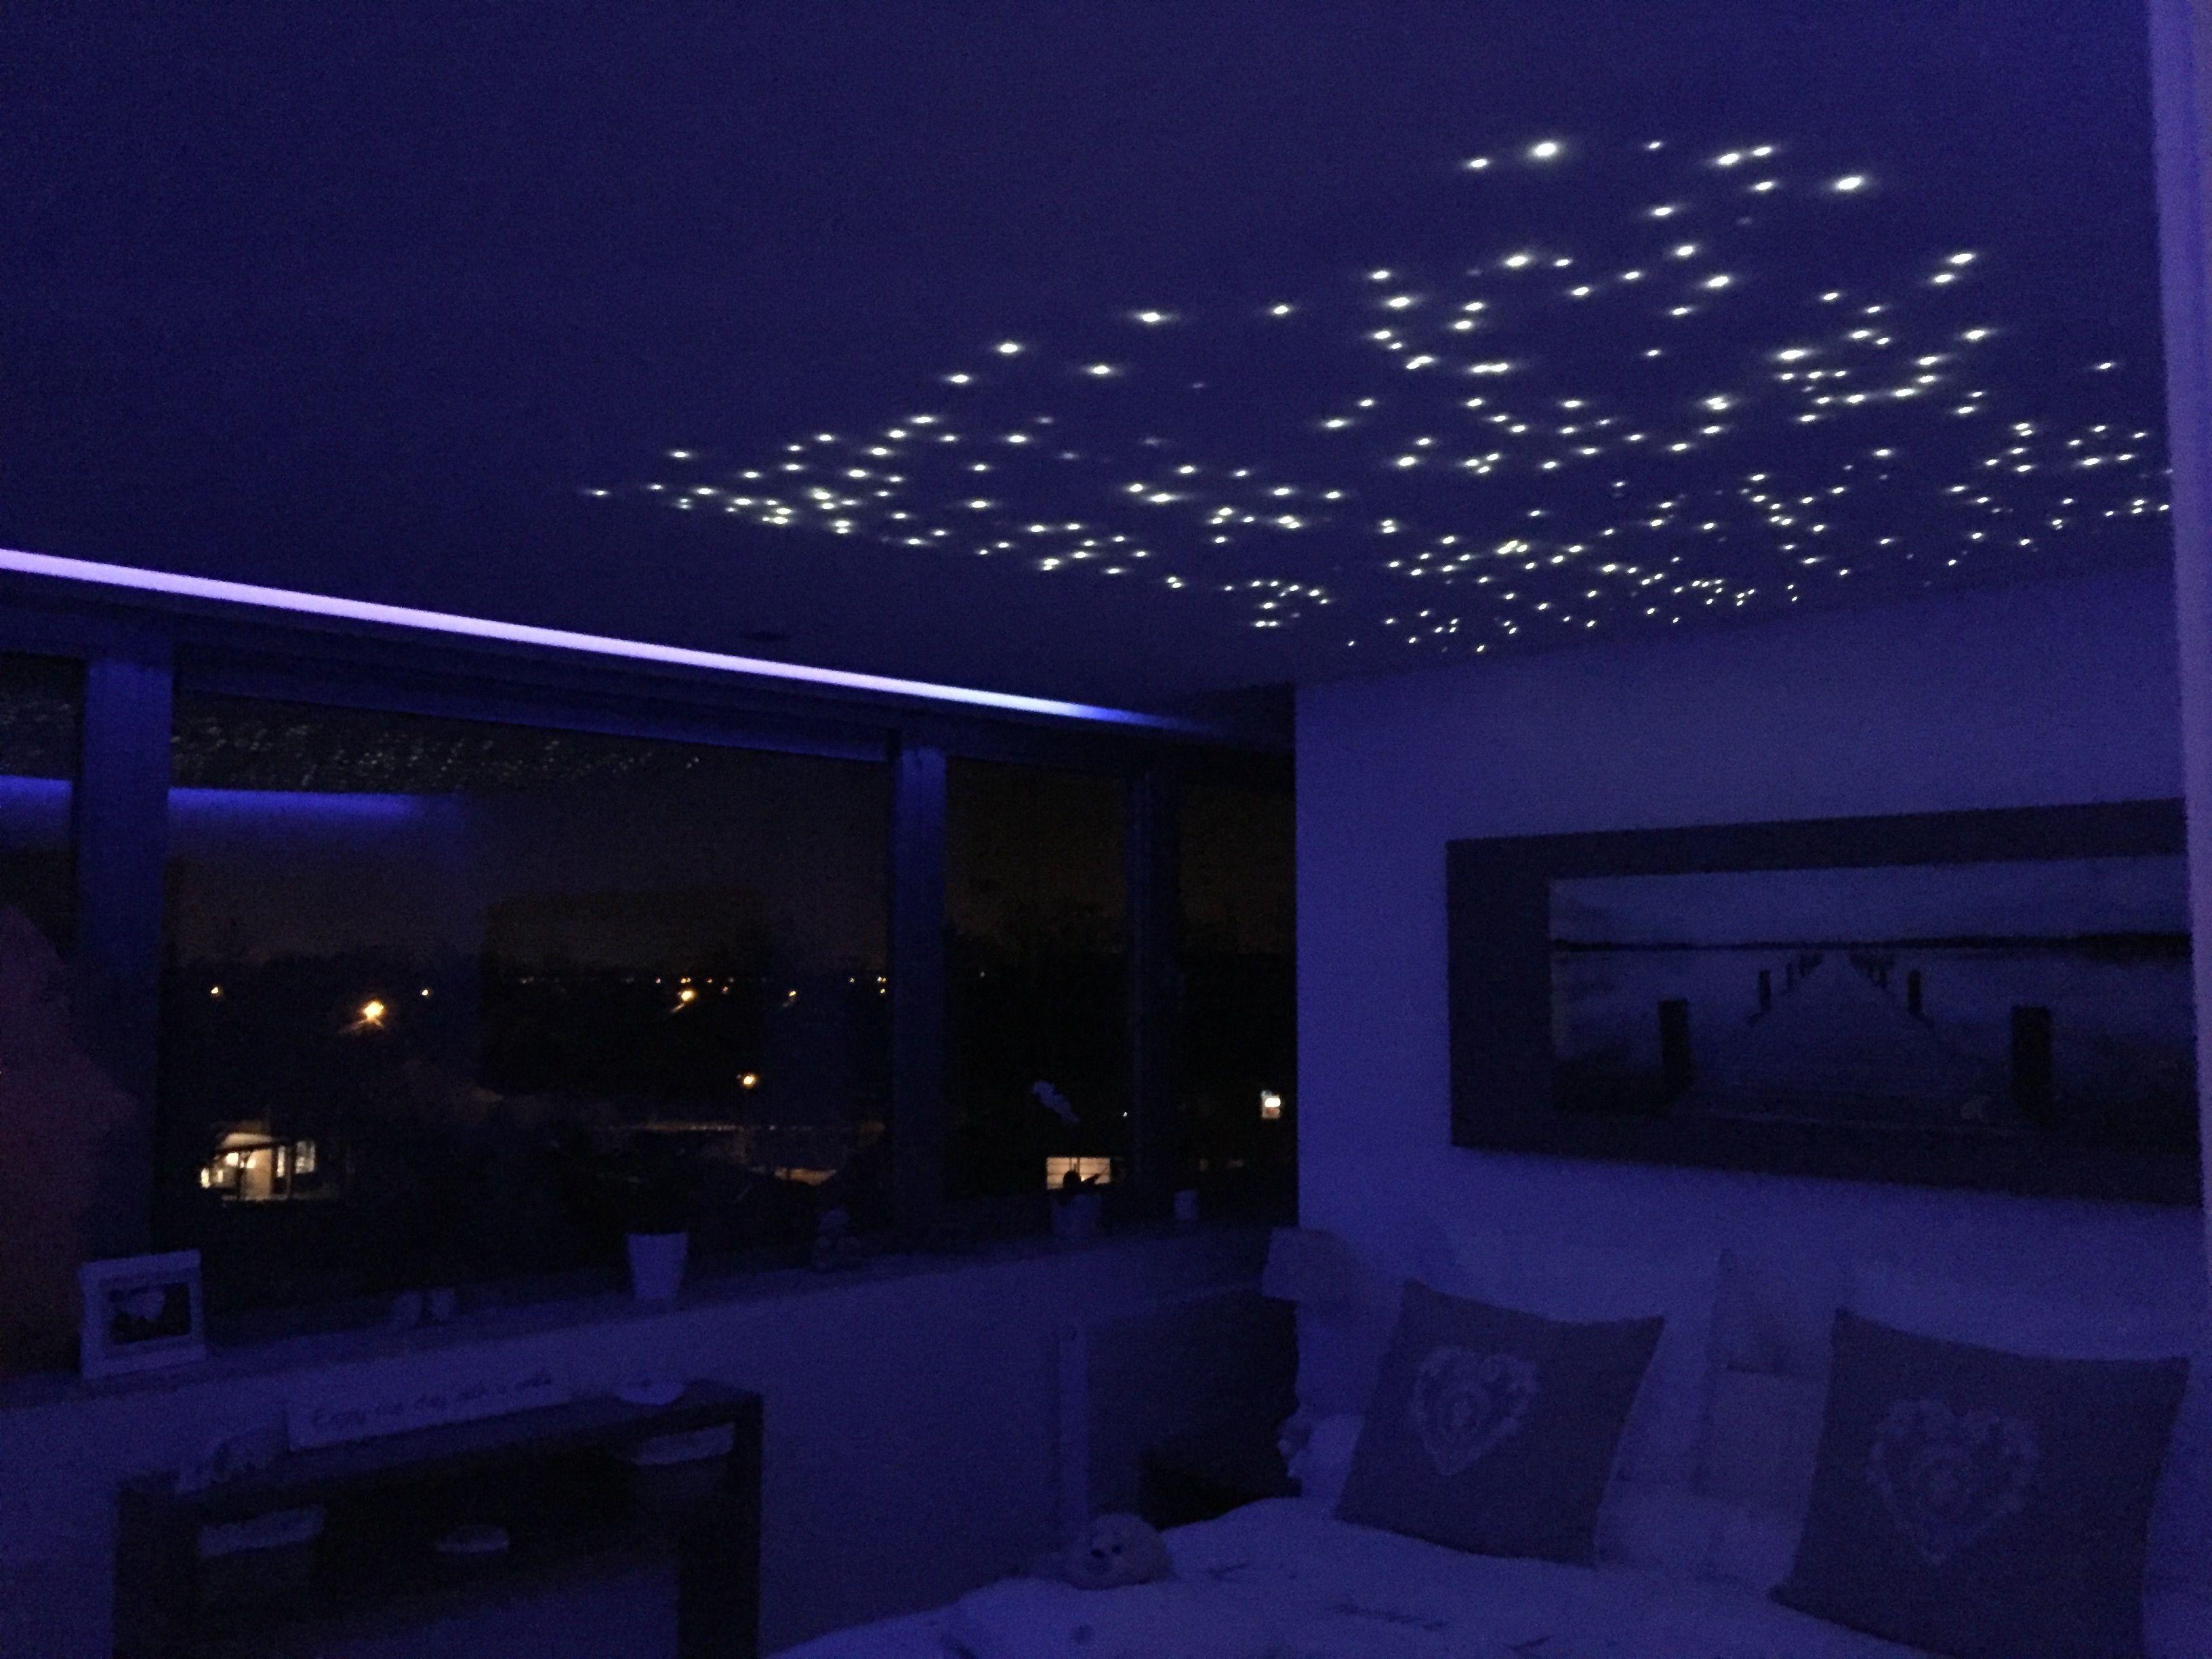 8a1cfbff3d172a31f0f91564a7fa18cf Faszinierend System Led Lichterketten Außen Dekorationen